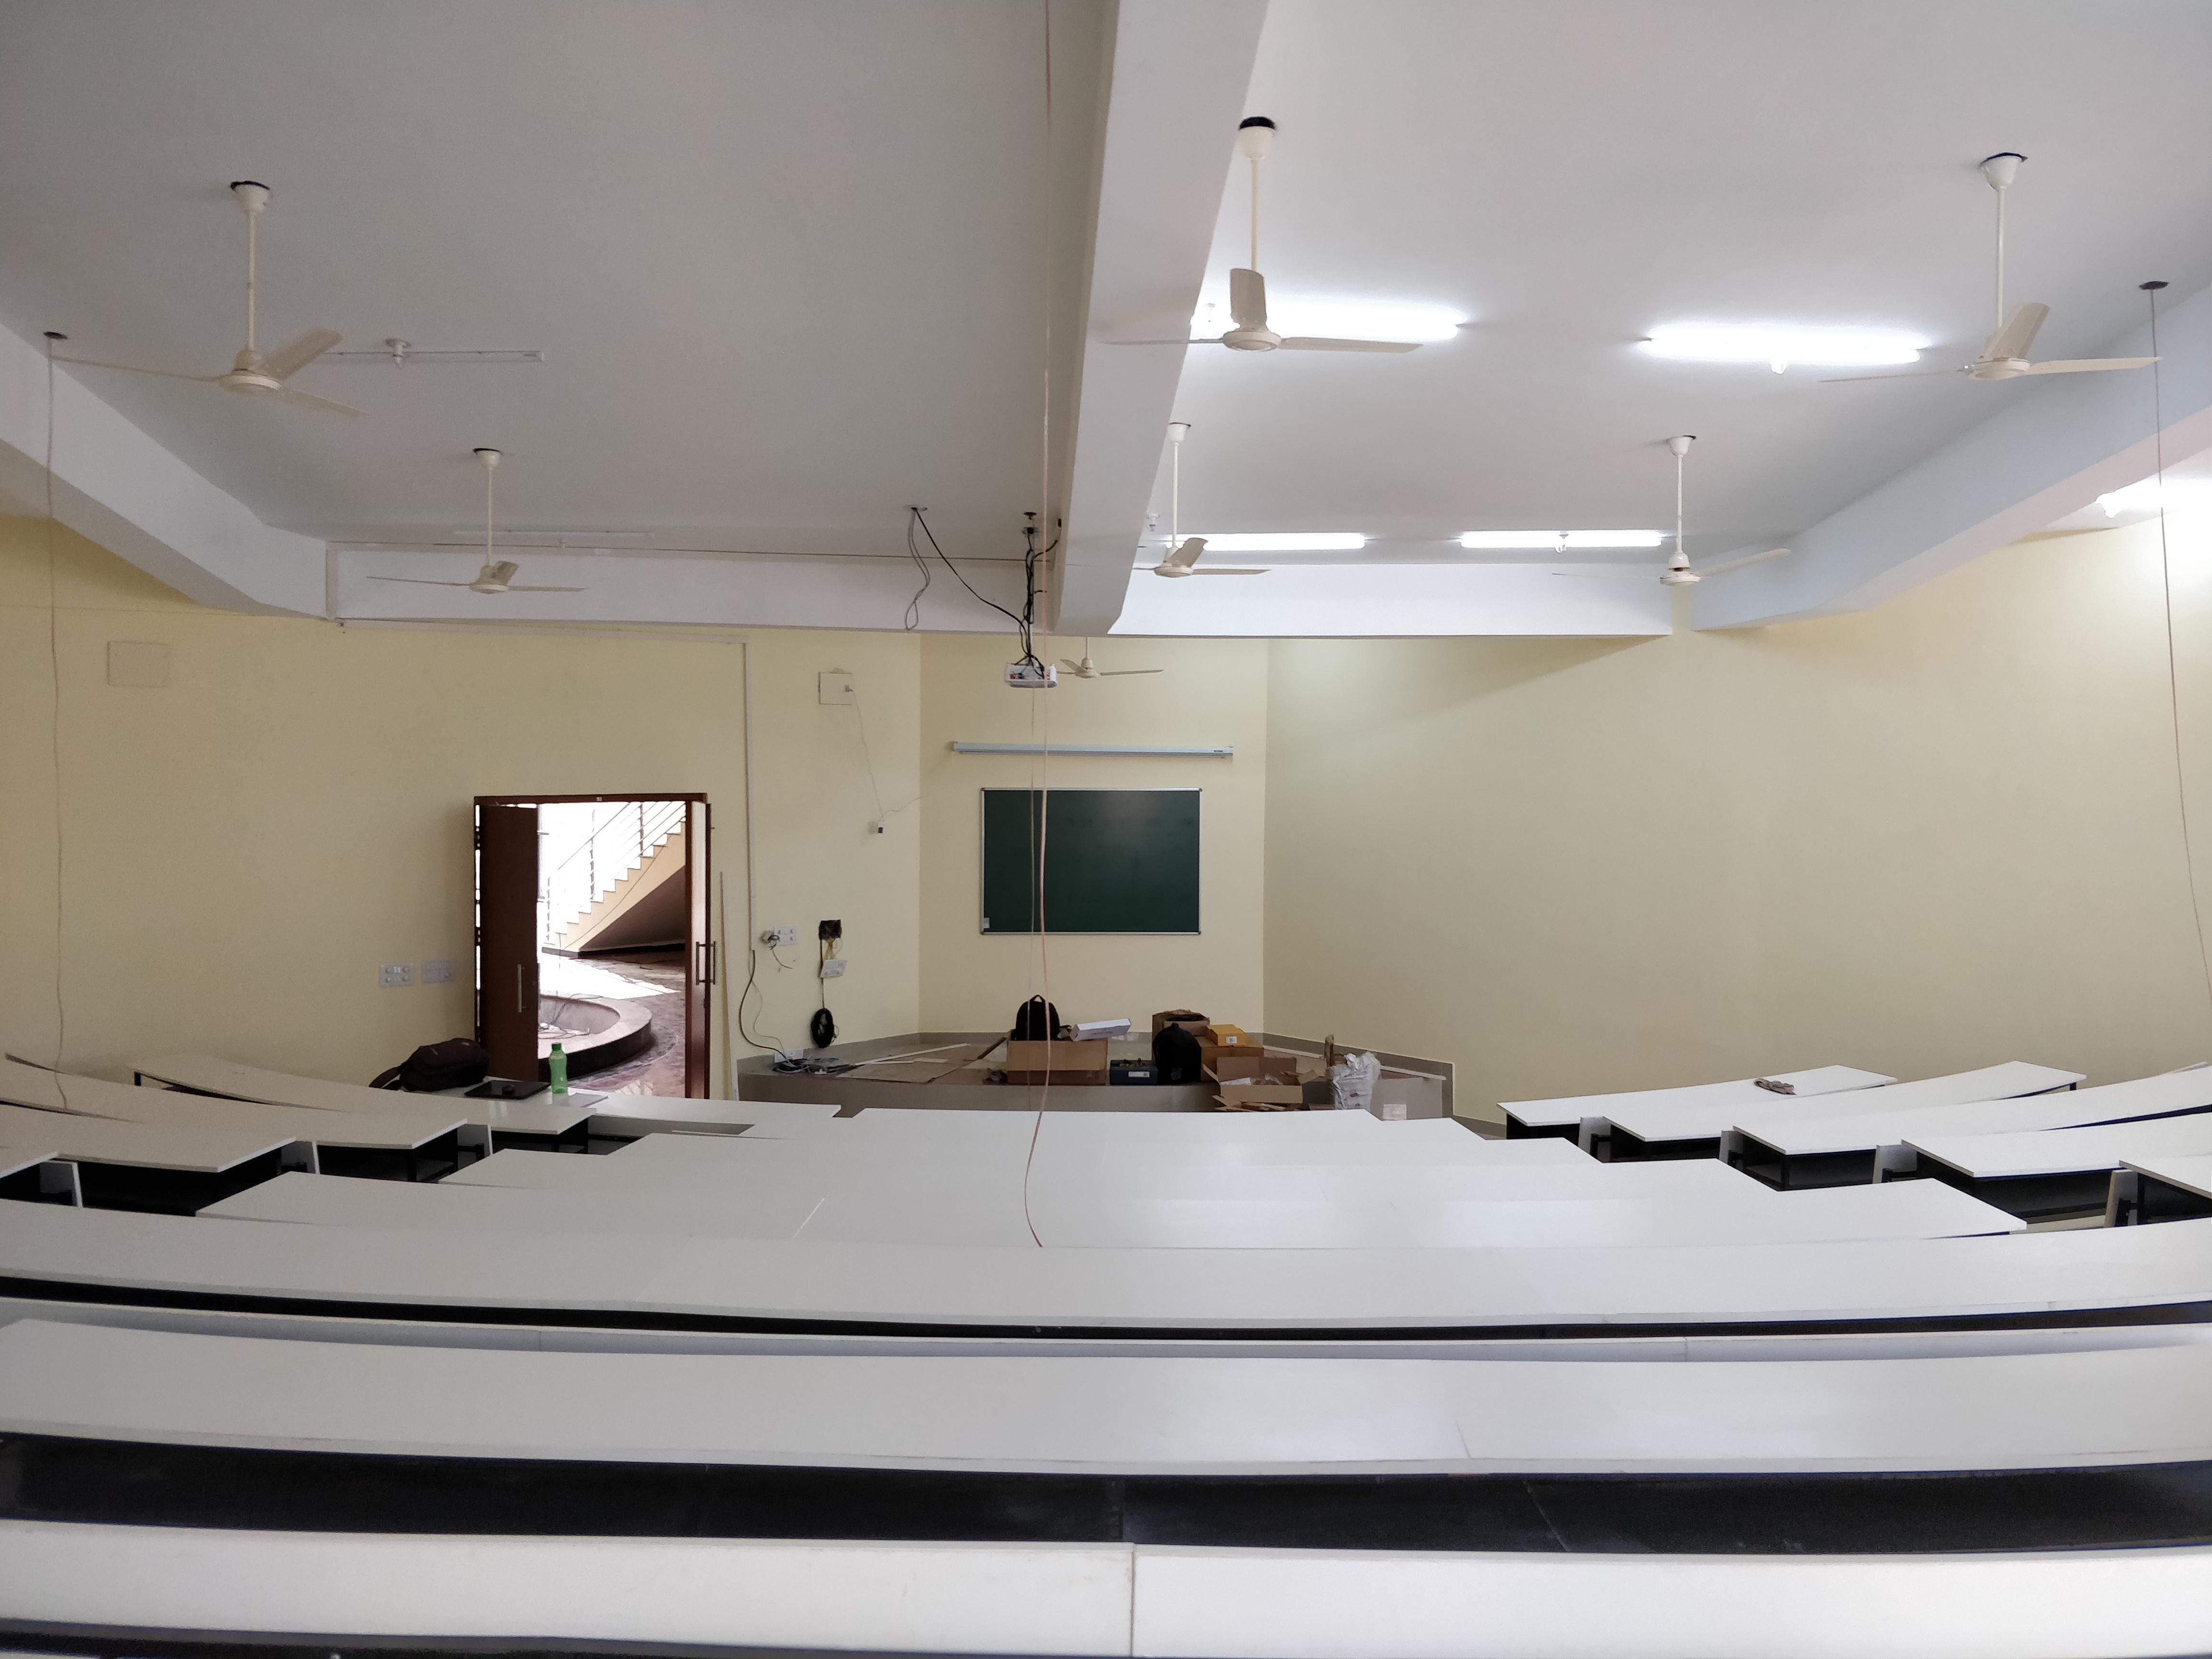 Auditorium Style Classroom